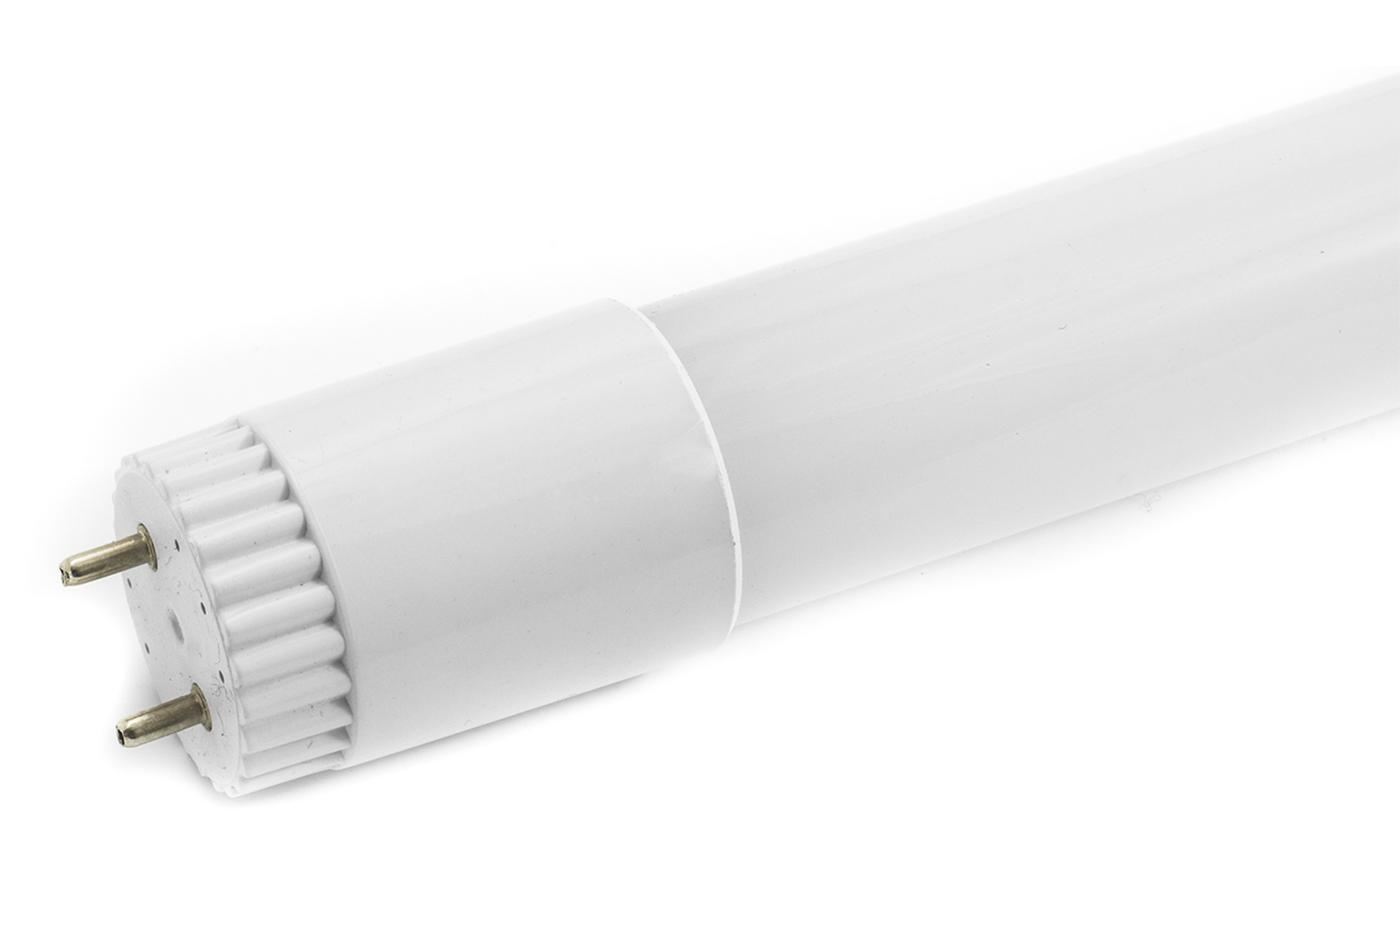 Plafoniere Neon 150 Cm : Bes tubi led beselettronica neon tubo w cm